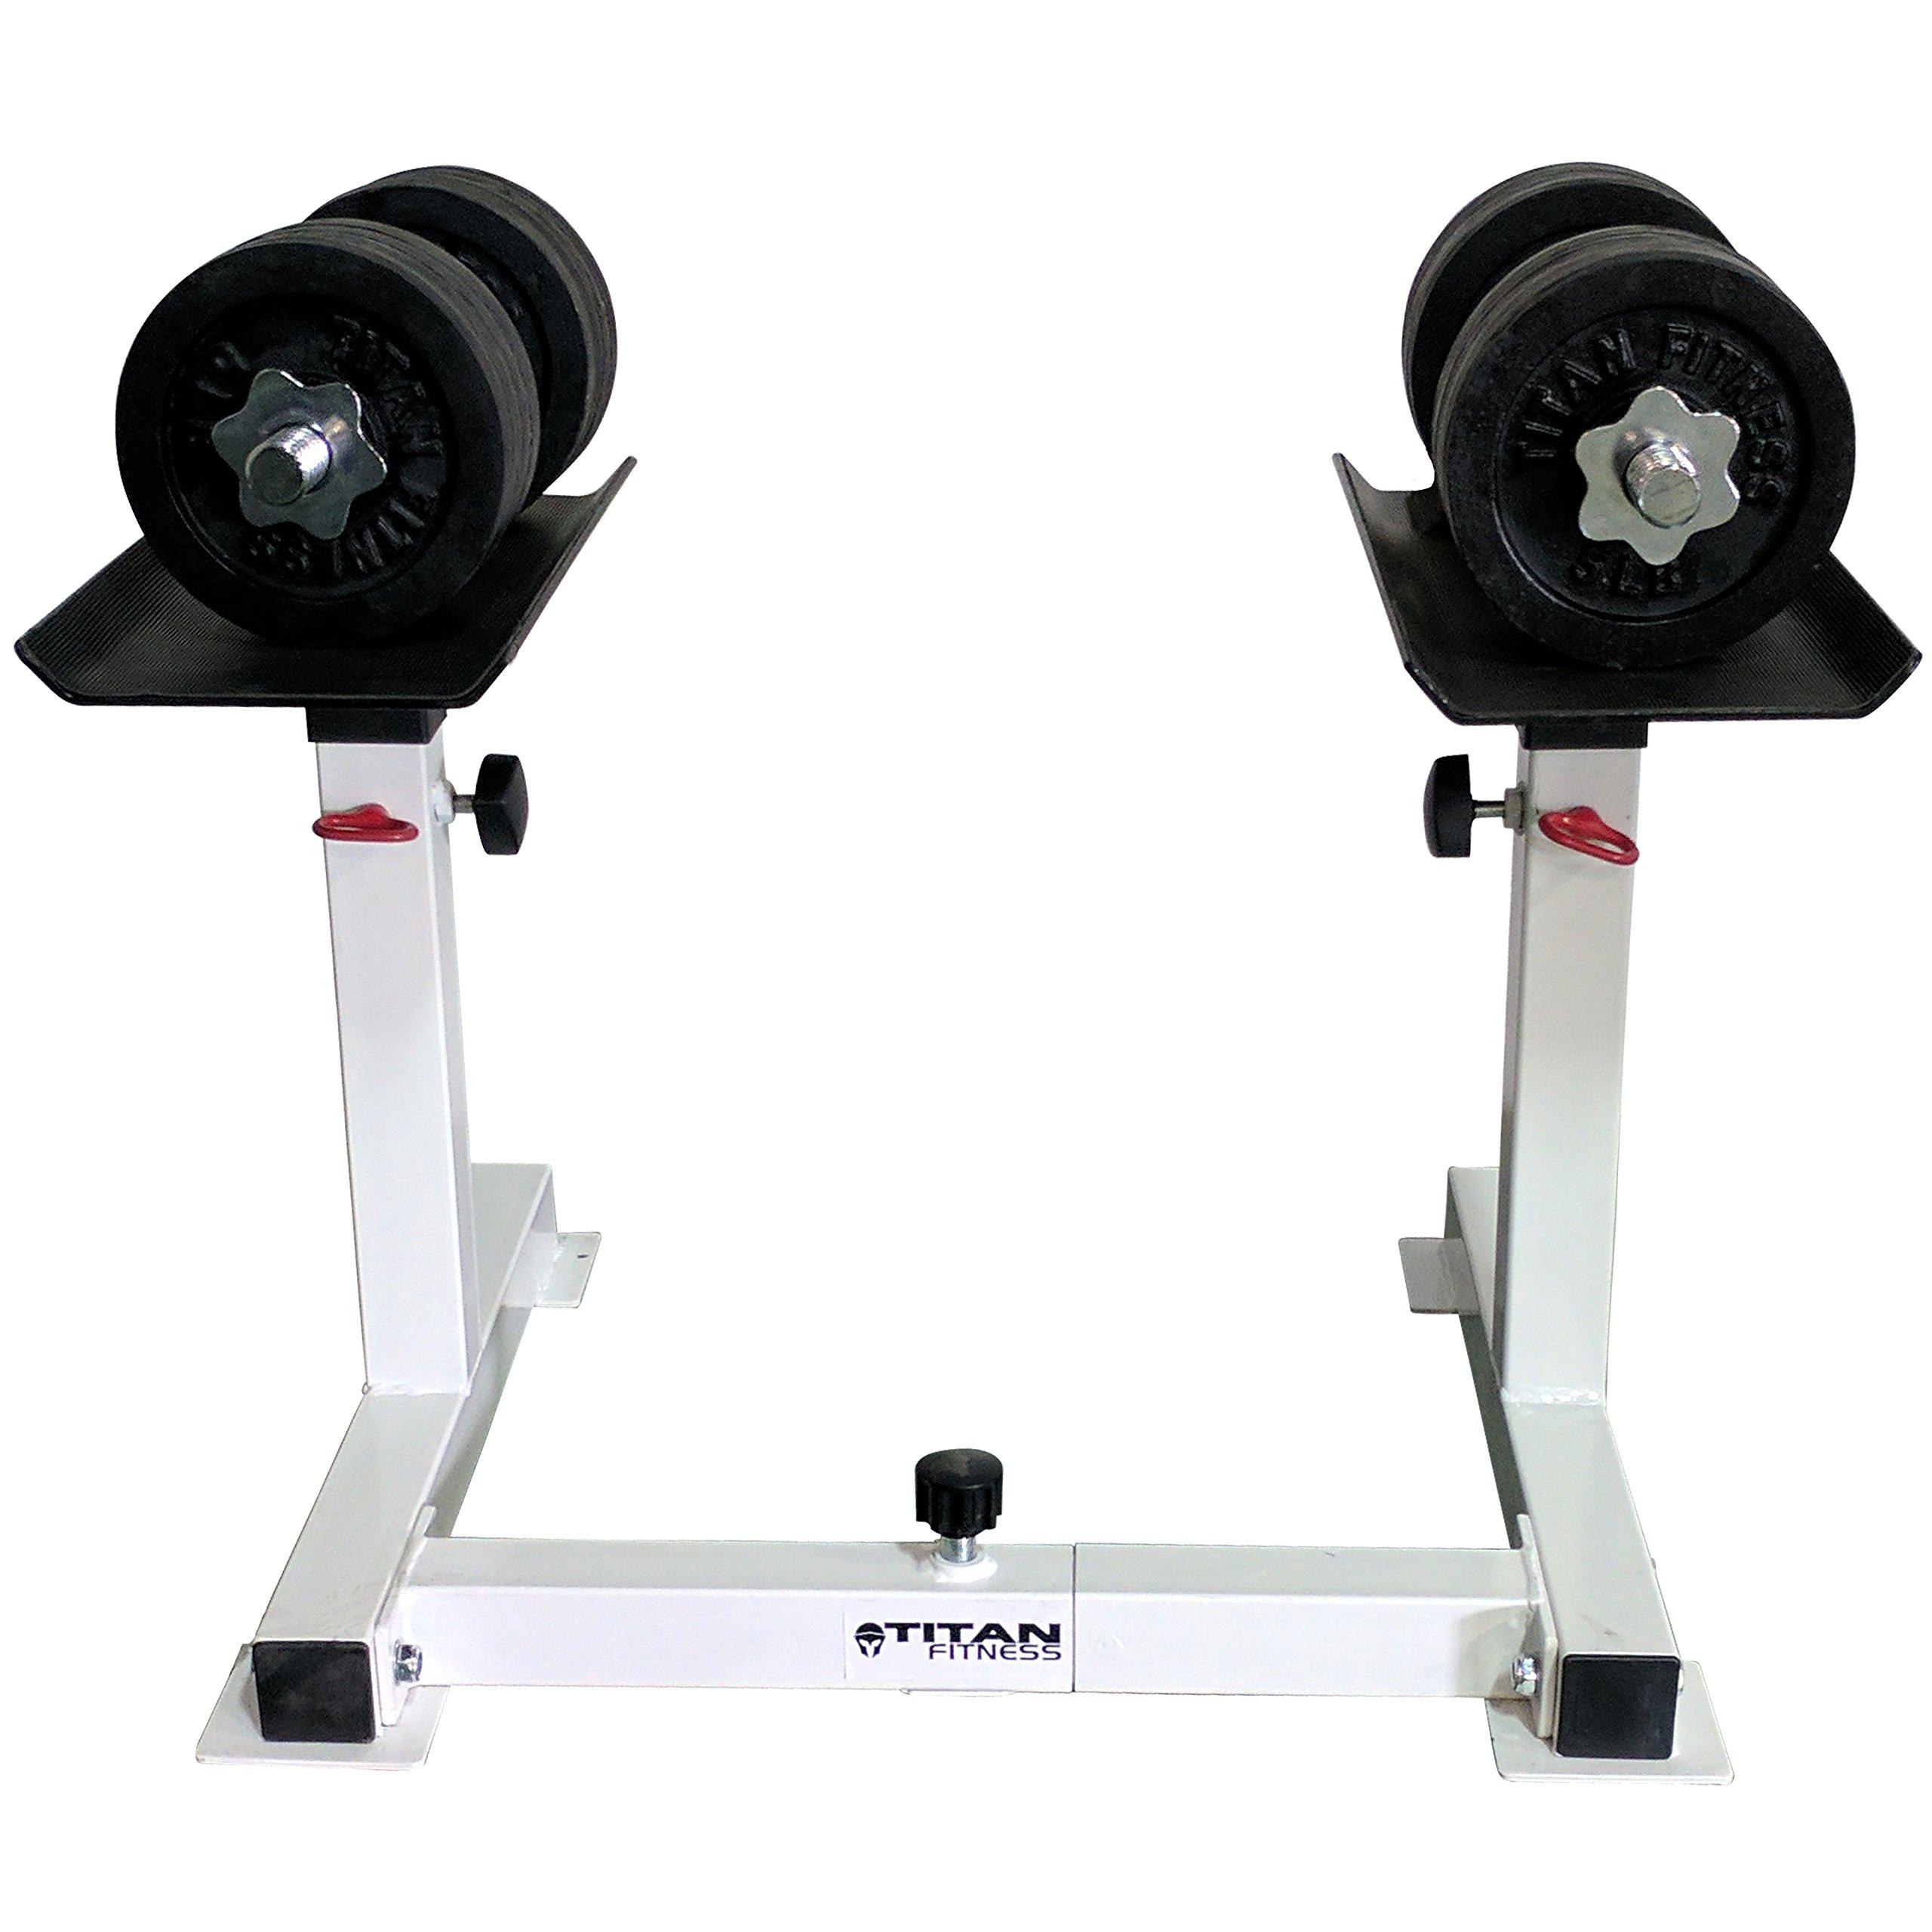 Titan Adjustable Height Dumbbell Holder by Titan Fitness (Image #5)